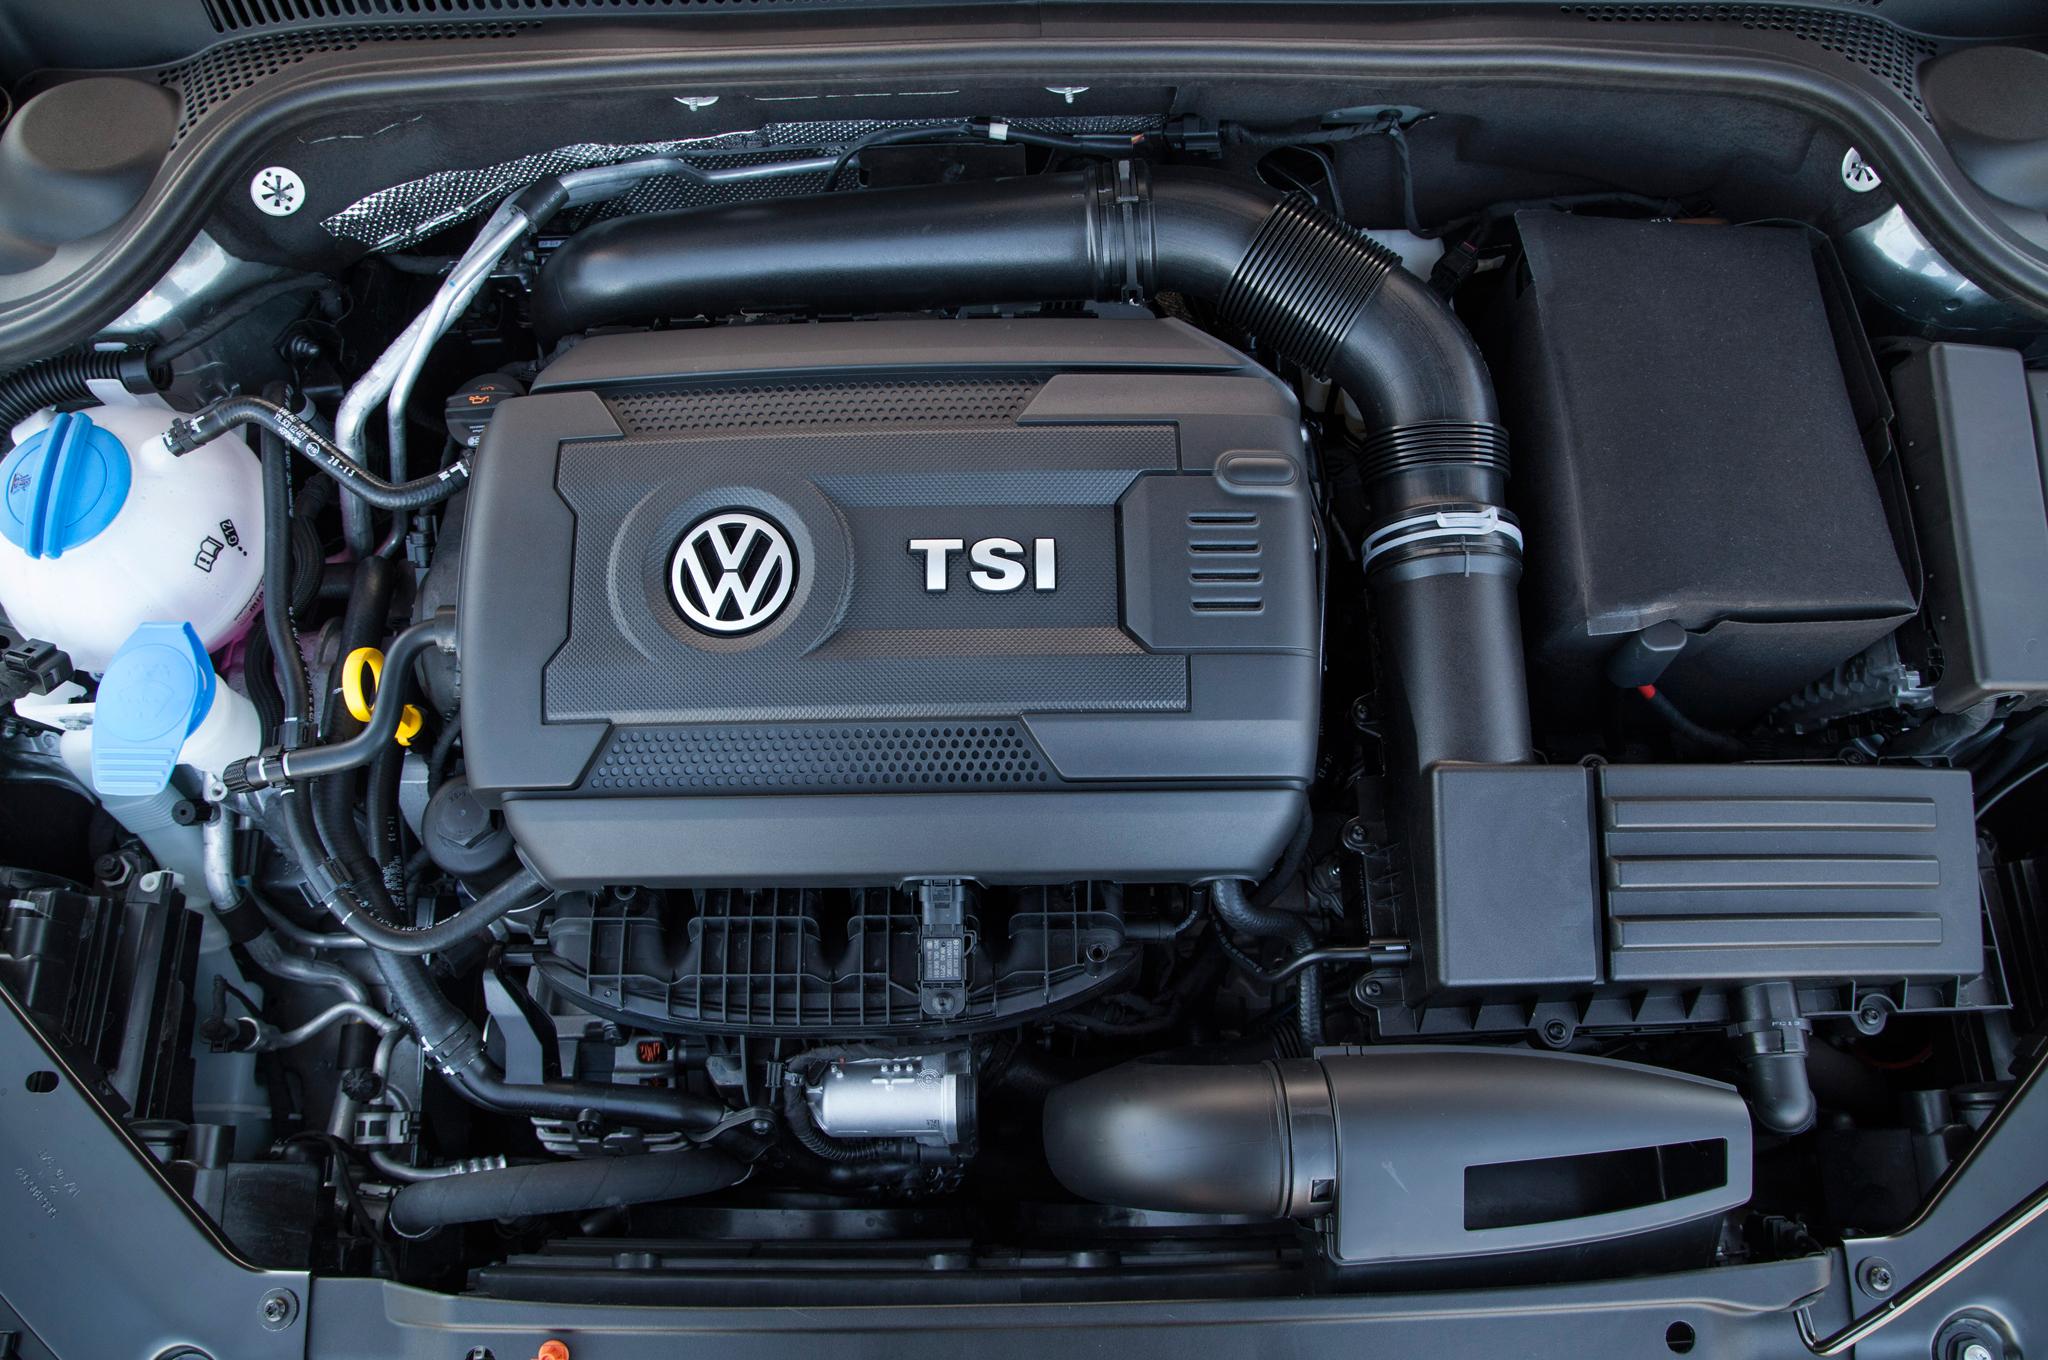 17-jetta-1-8-engine - EPautos - Libertarian Car Talk